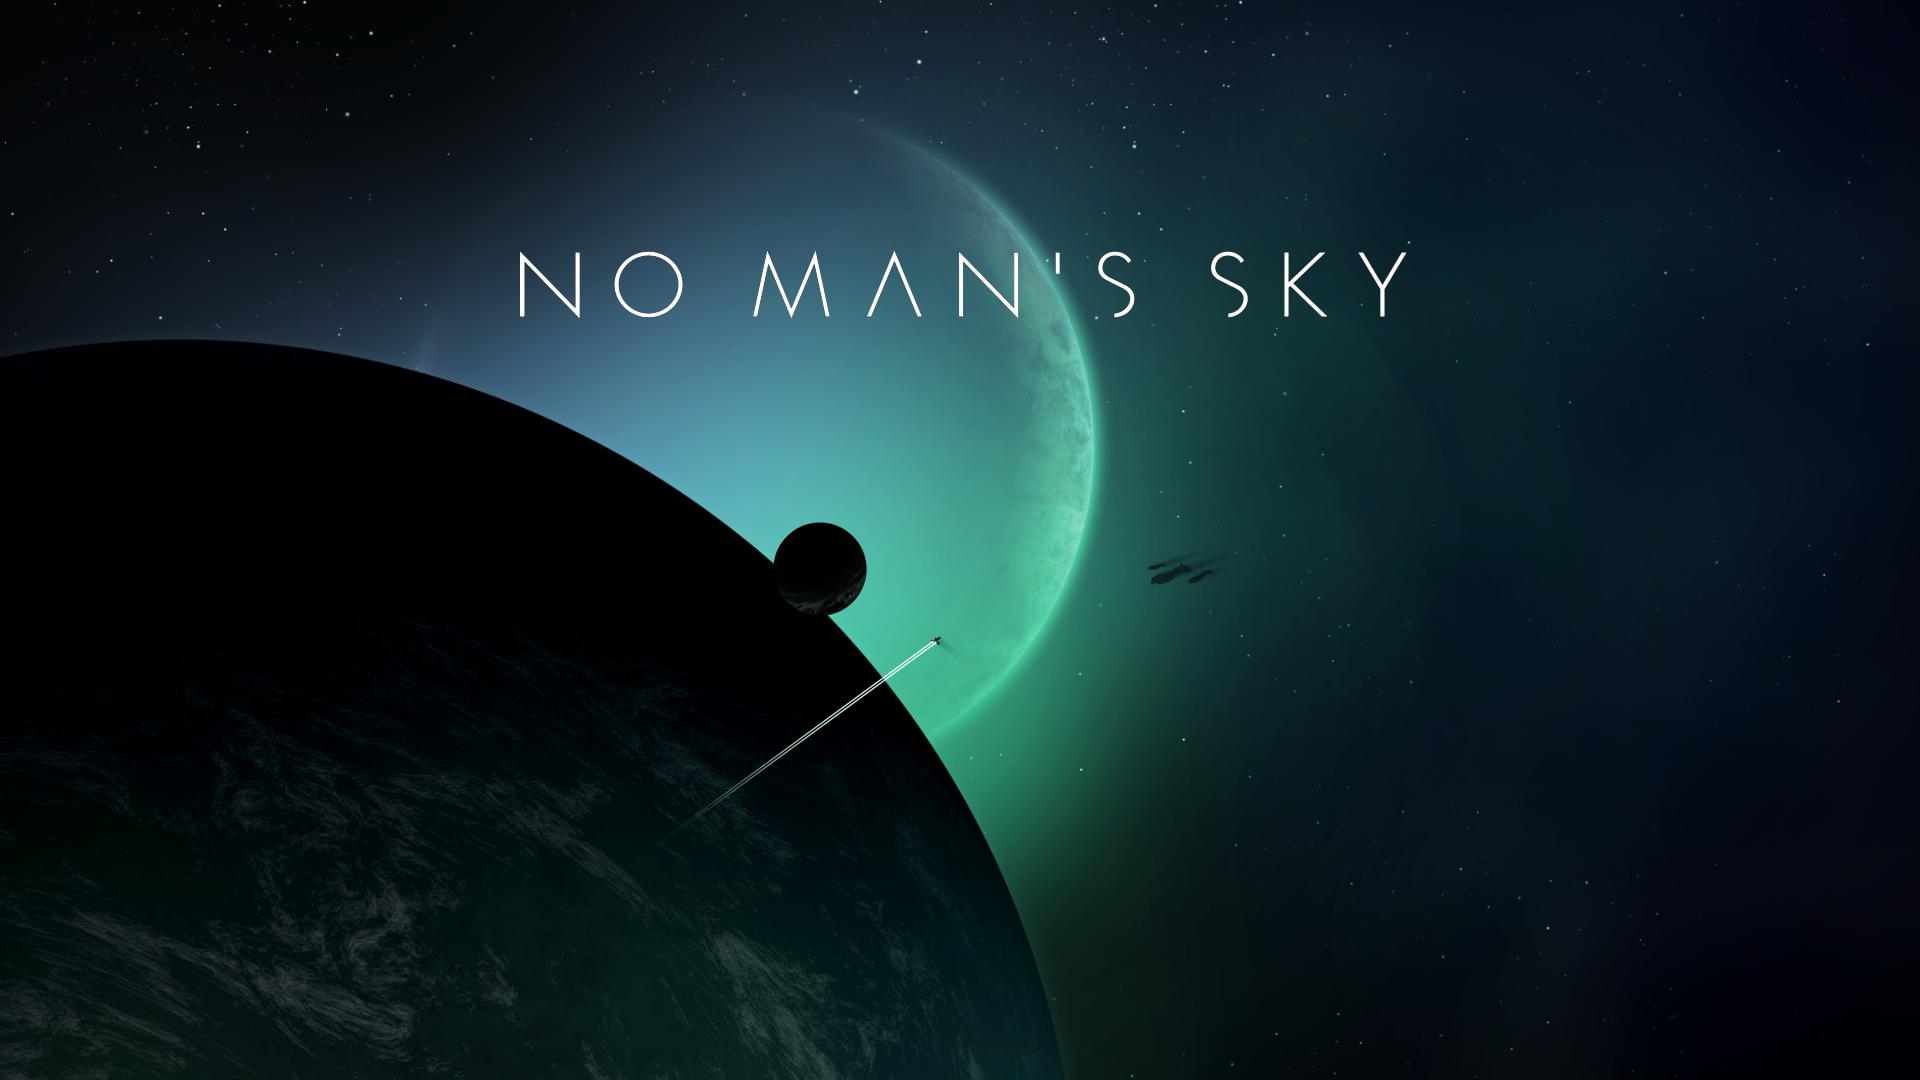 Station - No Man's Sky Wallpaper